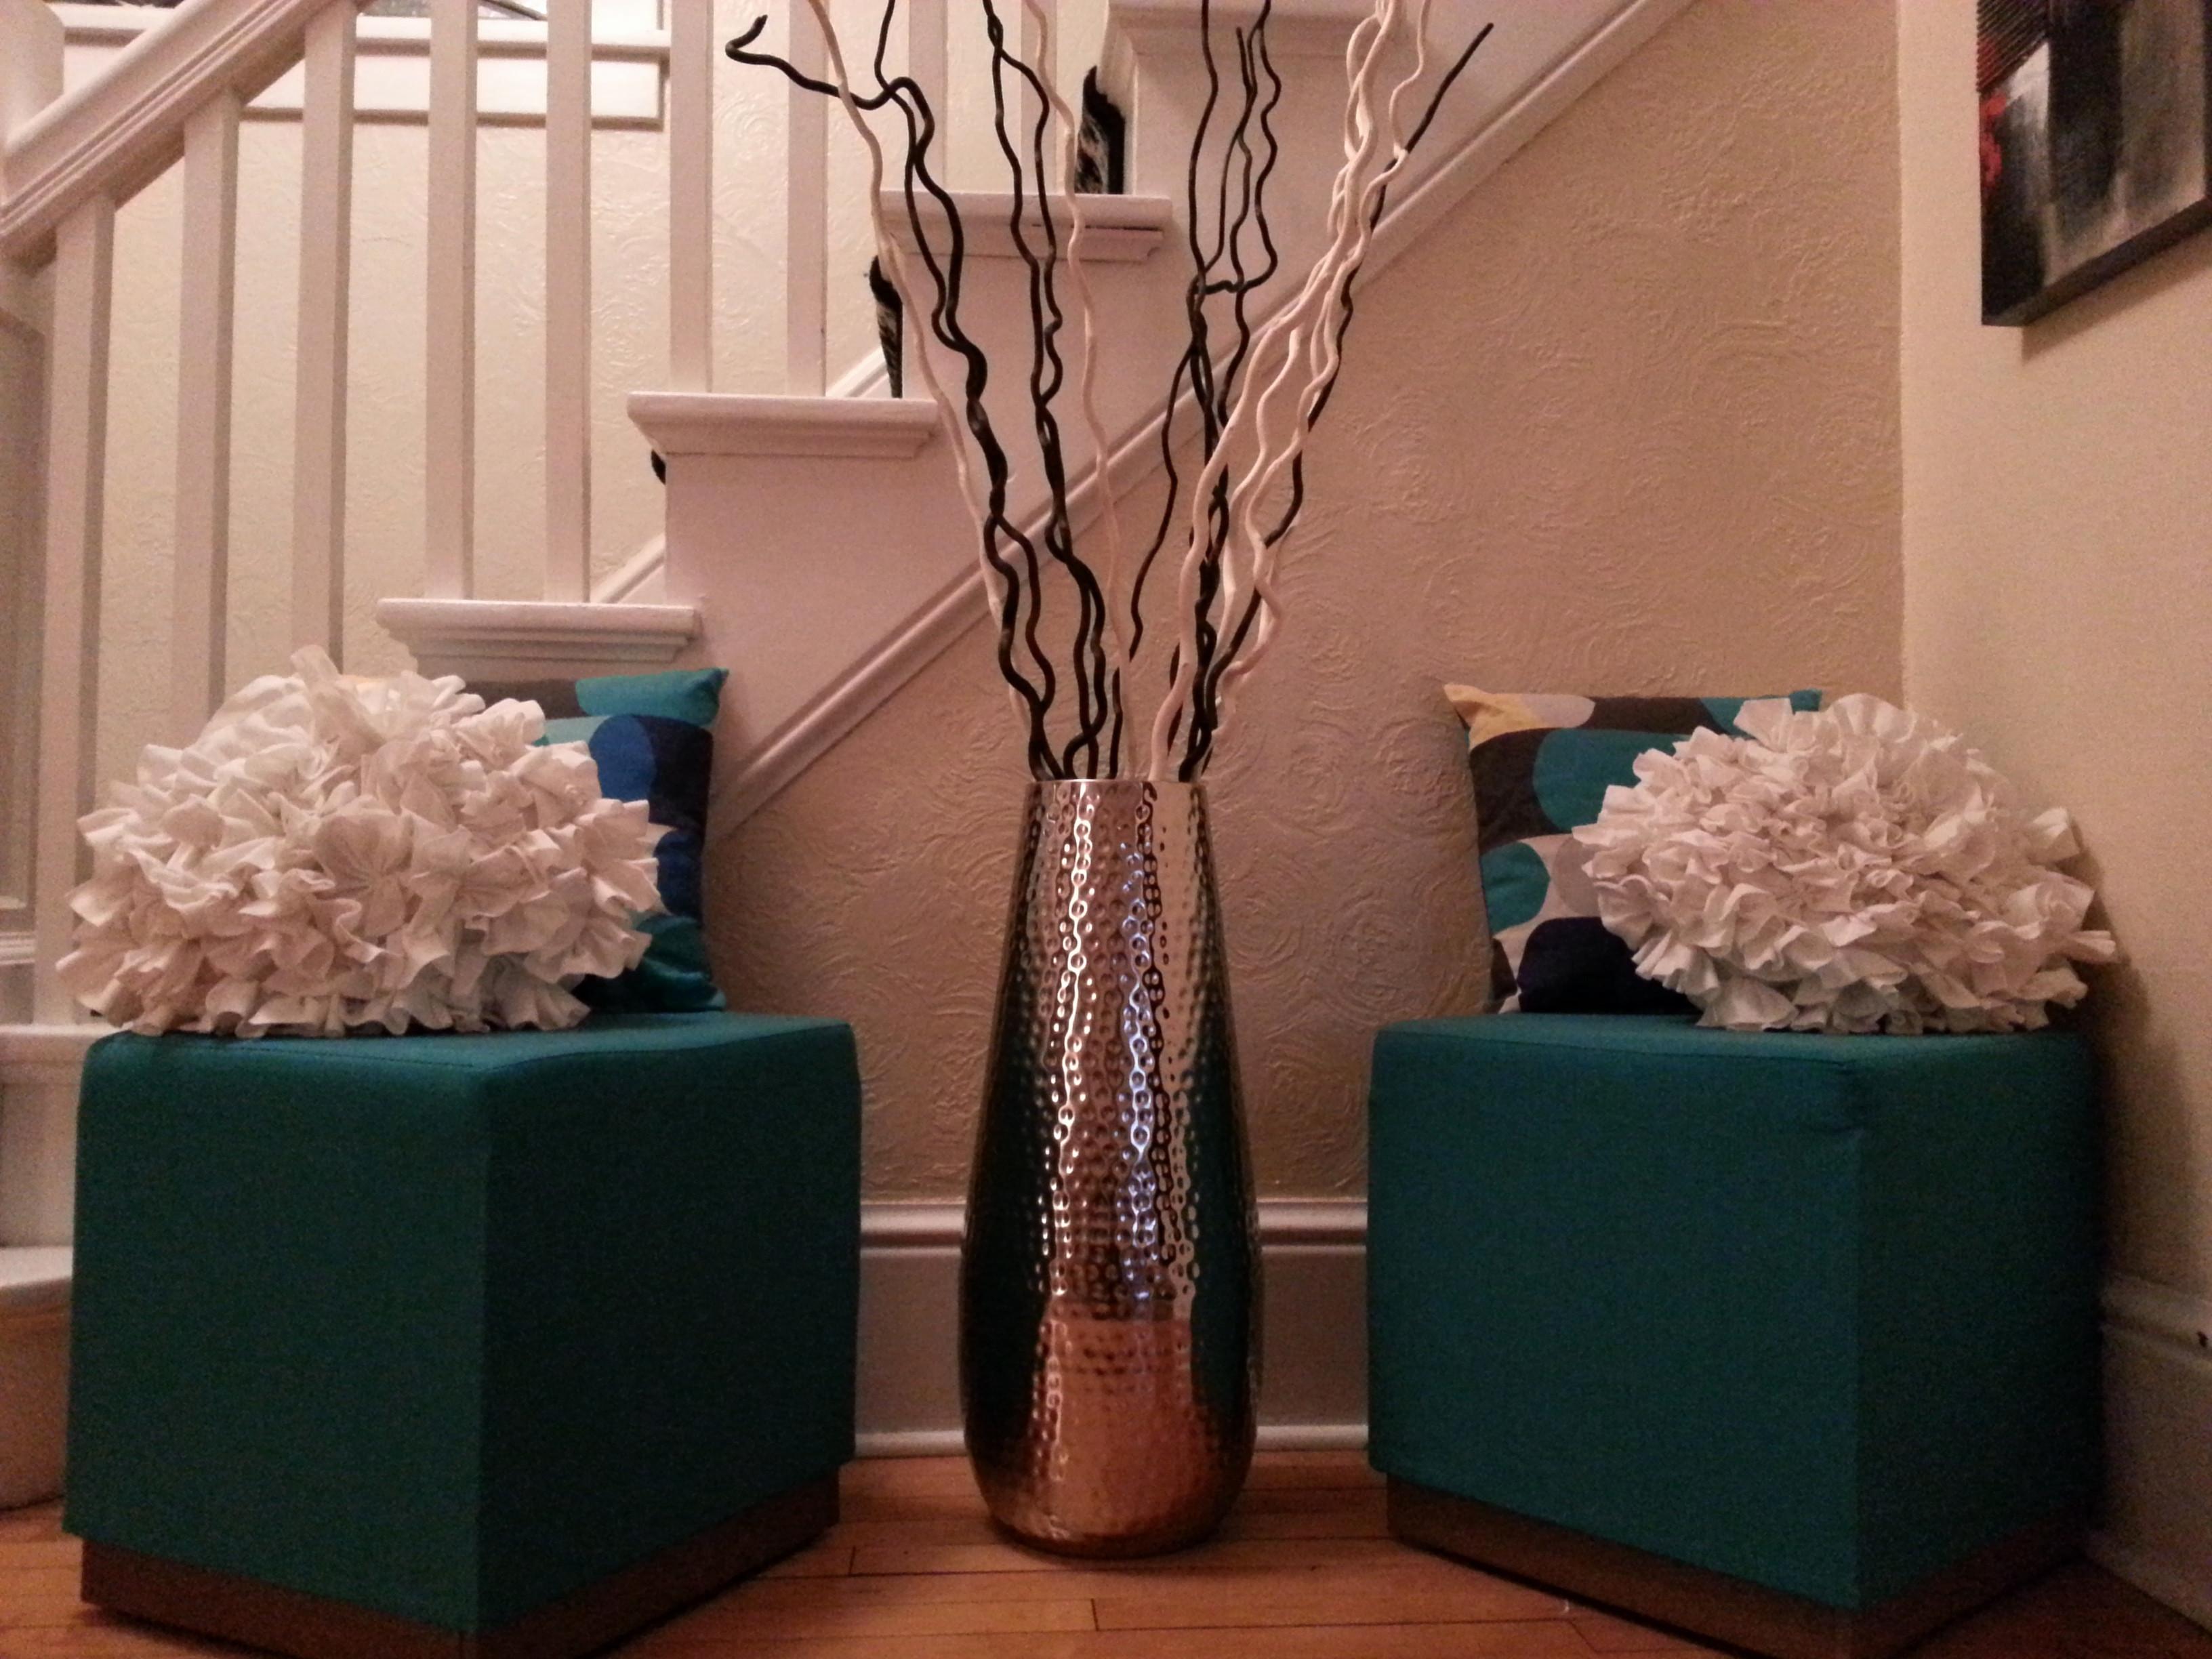 ceramic wall vase of decorative vases for living room elegant 45 inspirational ideas for pertaining to decorative vases for living room elegant 45 inspirational ideas for living room decor graph